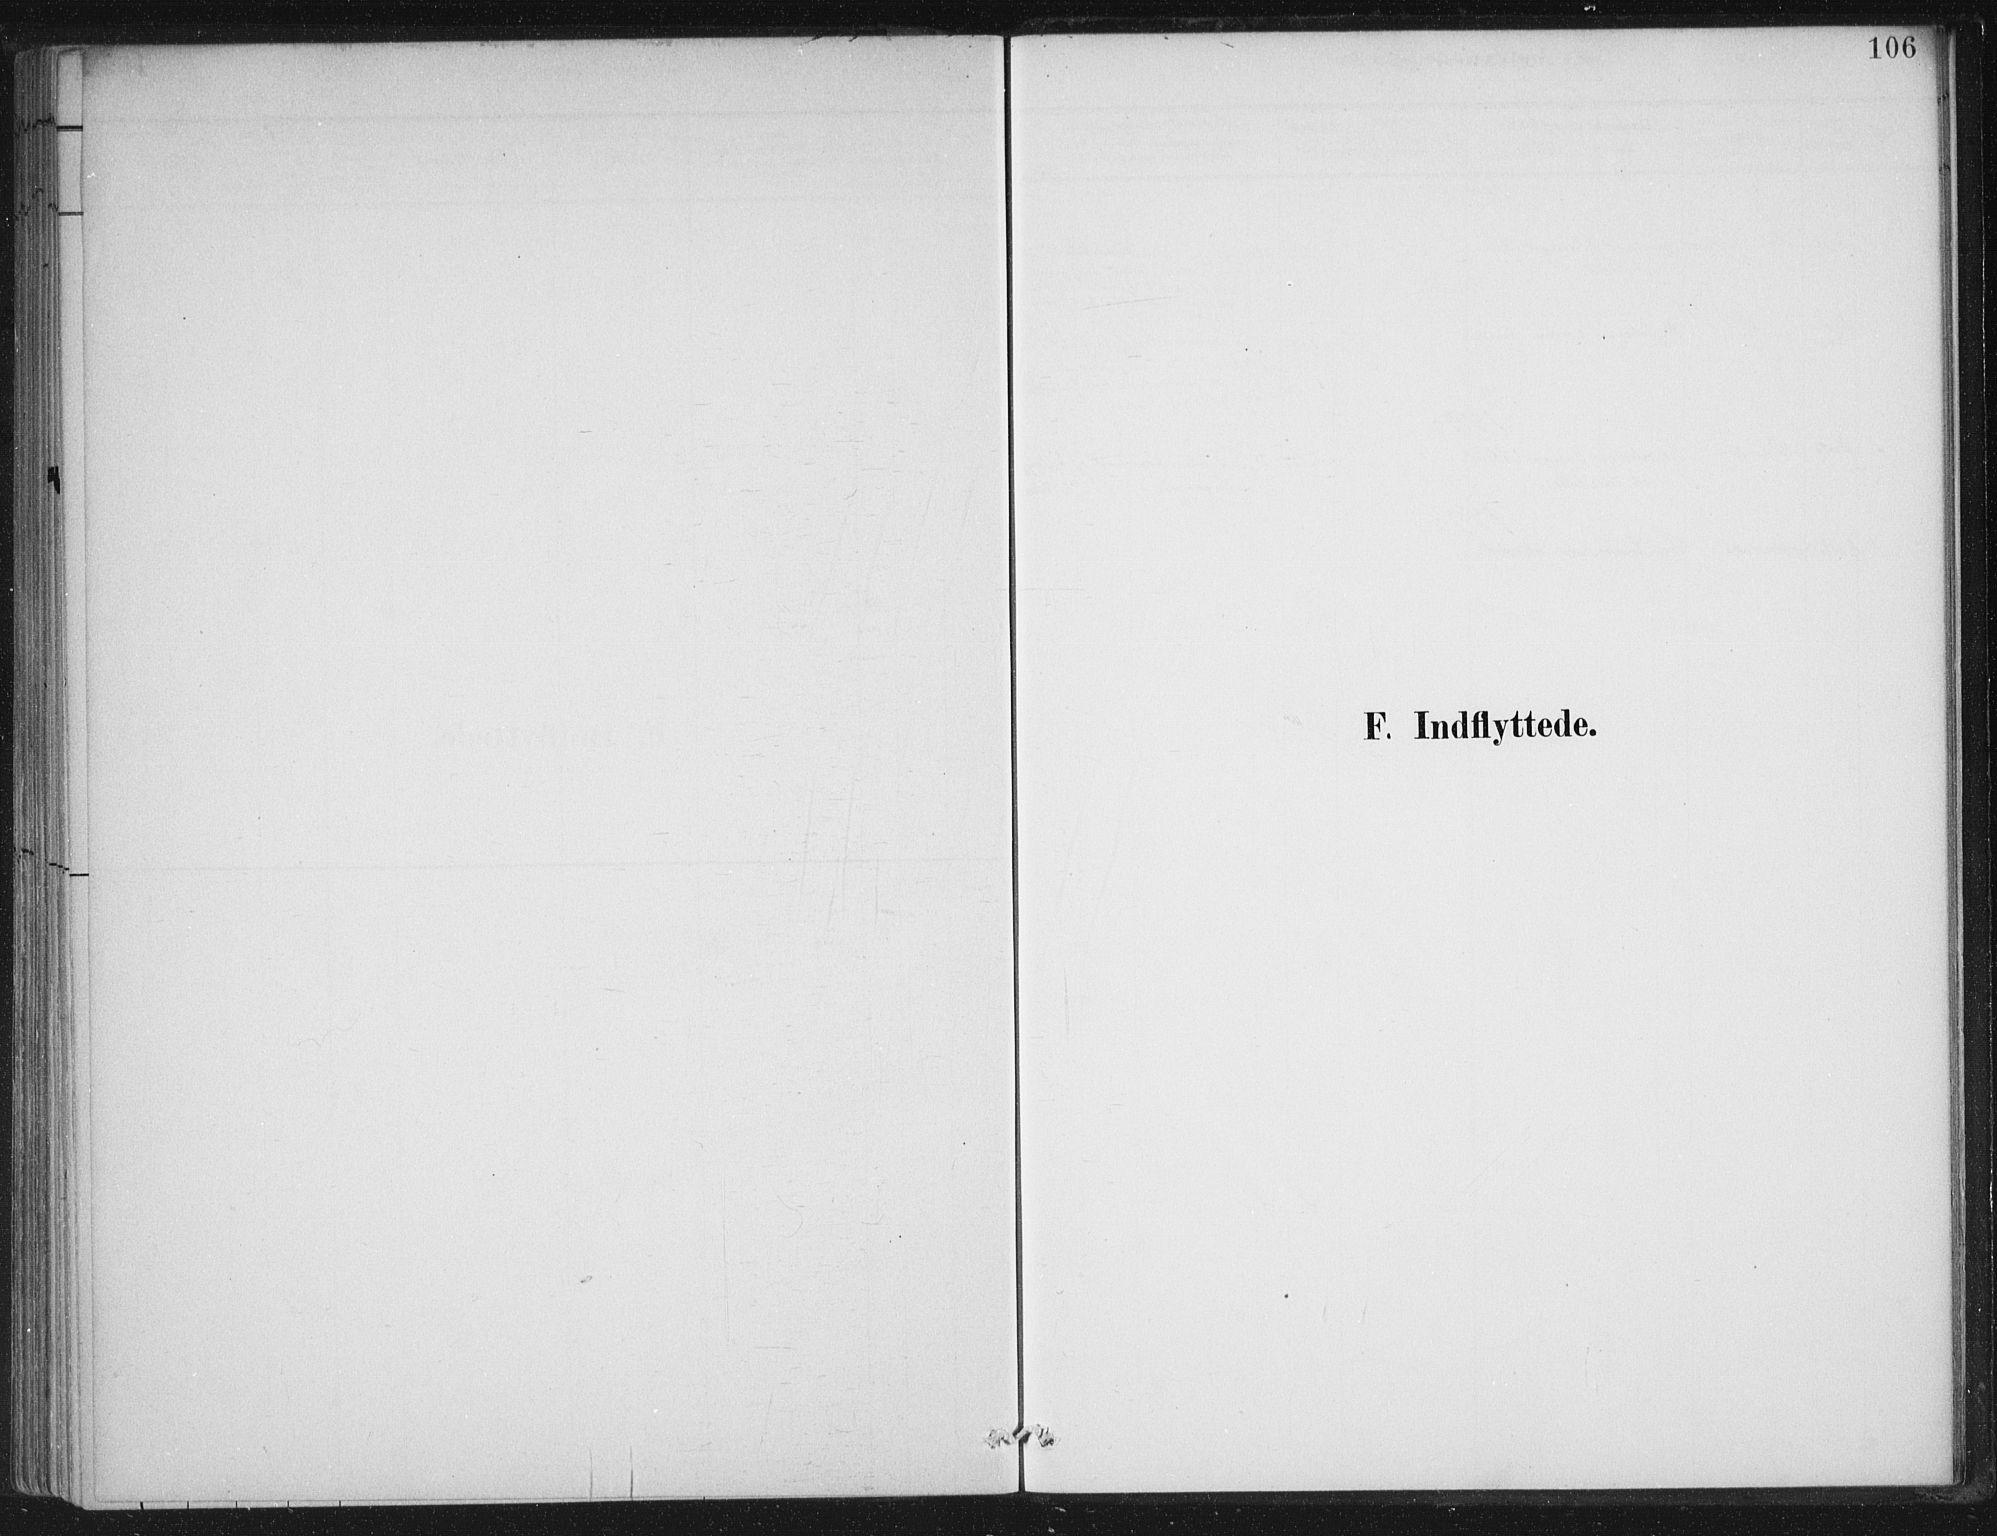 SAB, Gloppen sokneprestembete, H/Haa/Haad/L0001: Ministerialbok nr. D  1, 1885-1910, s. 106